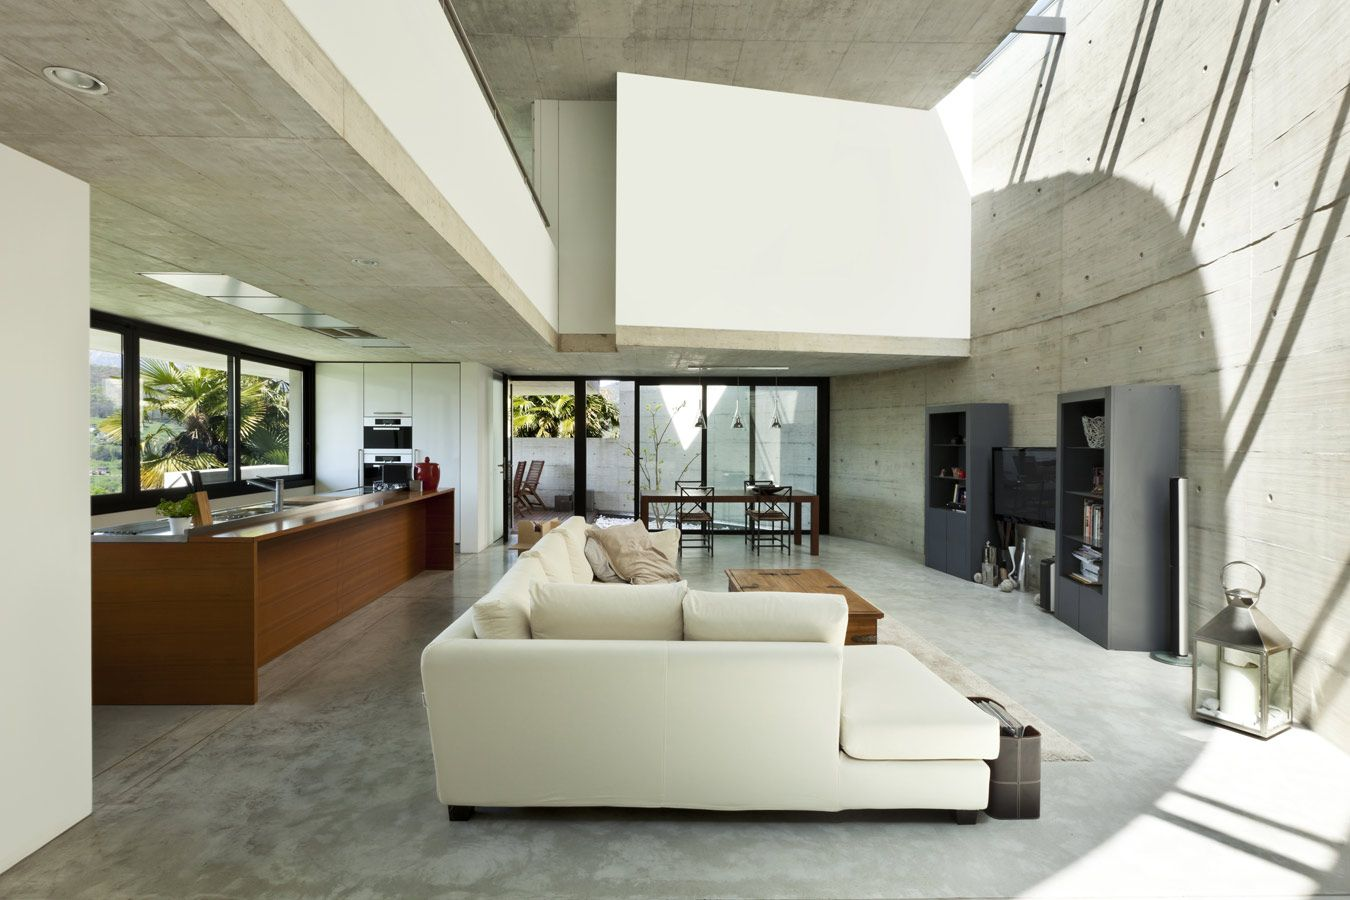 Woonkamer in gepolierde beton in combinatie met vloerverwarming ...